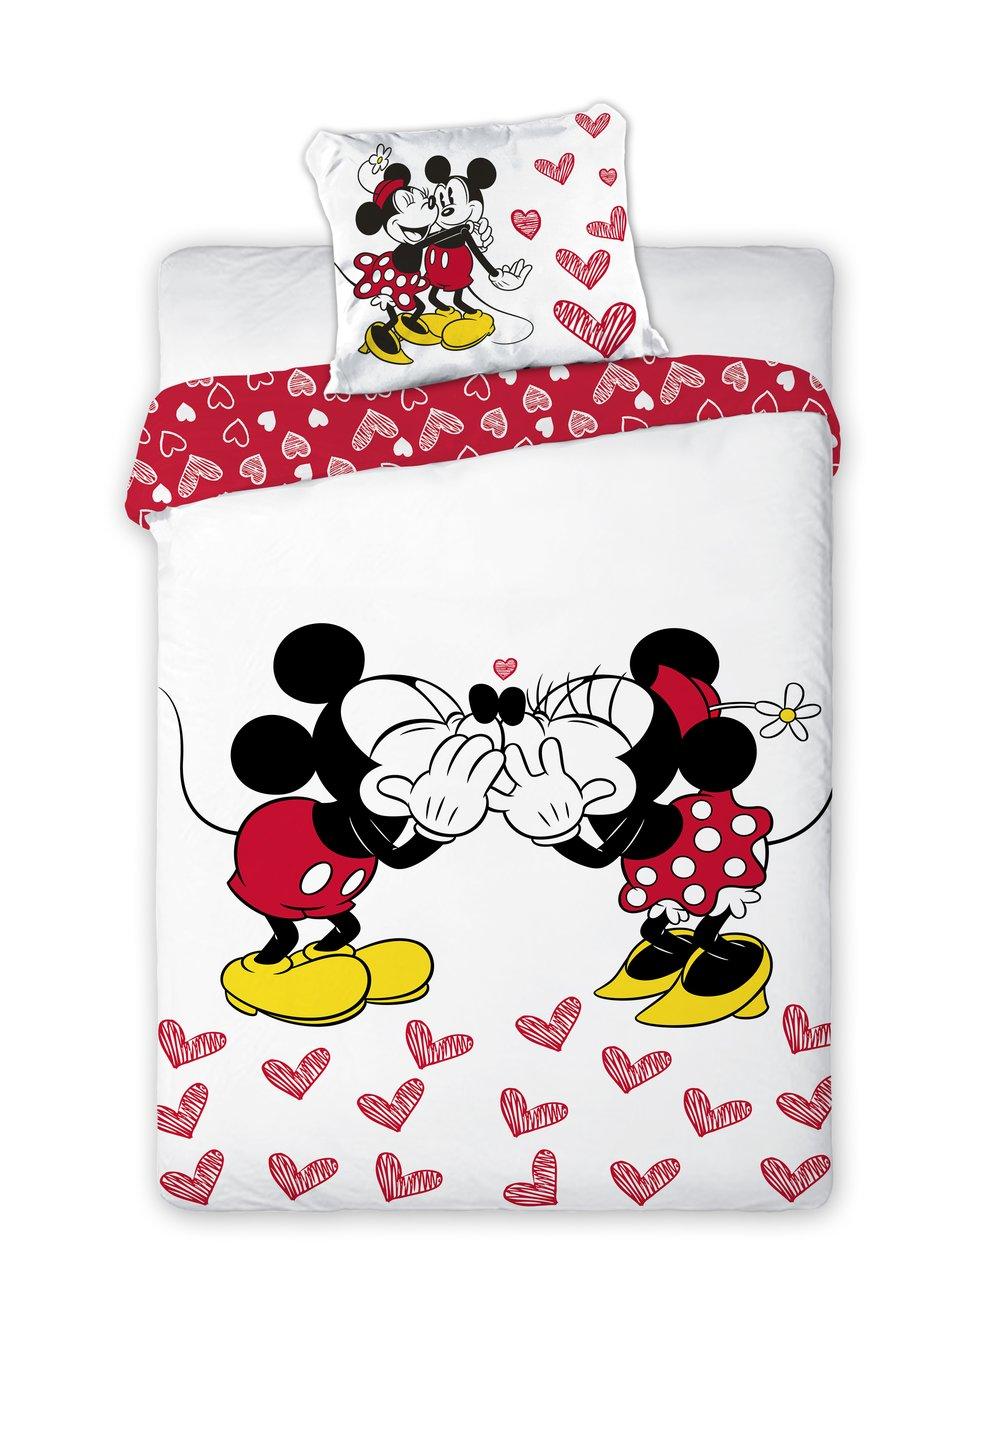 Lenjerie de pat, Minnie si Mickey, inimioare rosii, 160 x 200 cm imagine